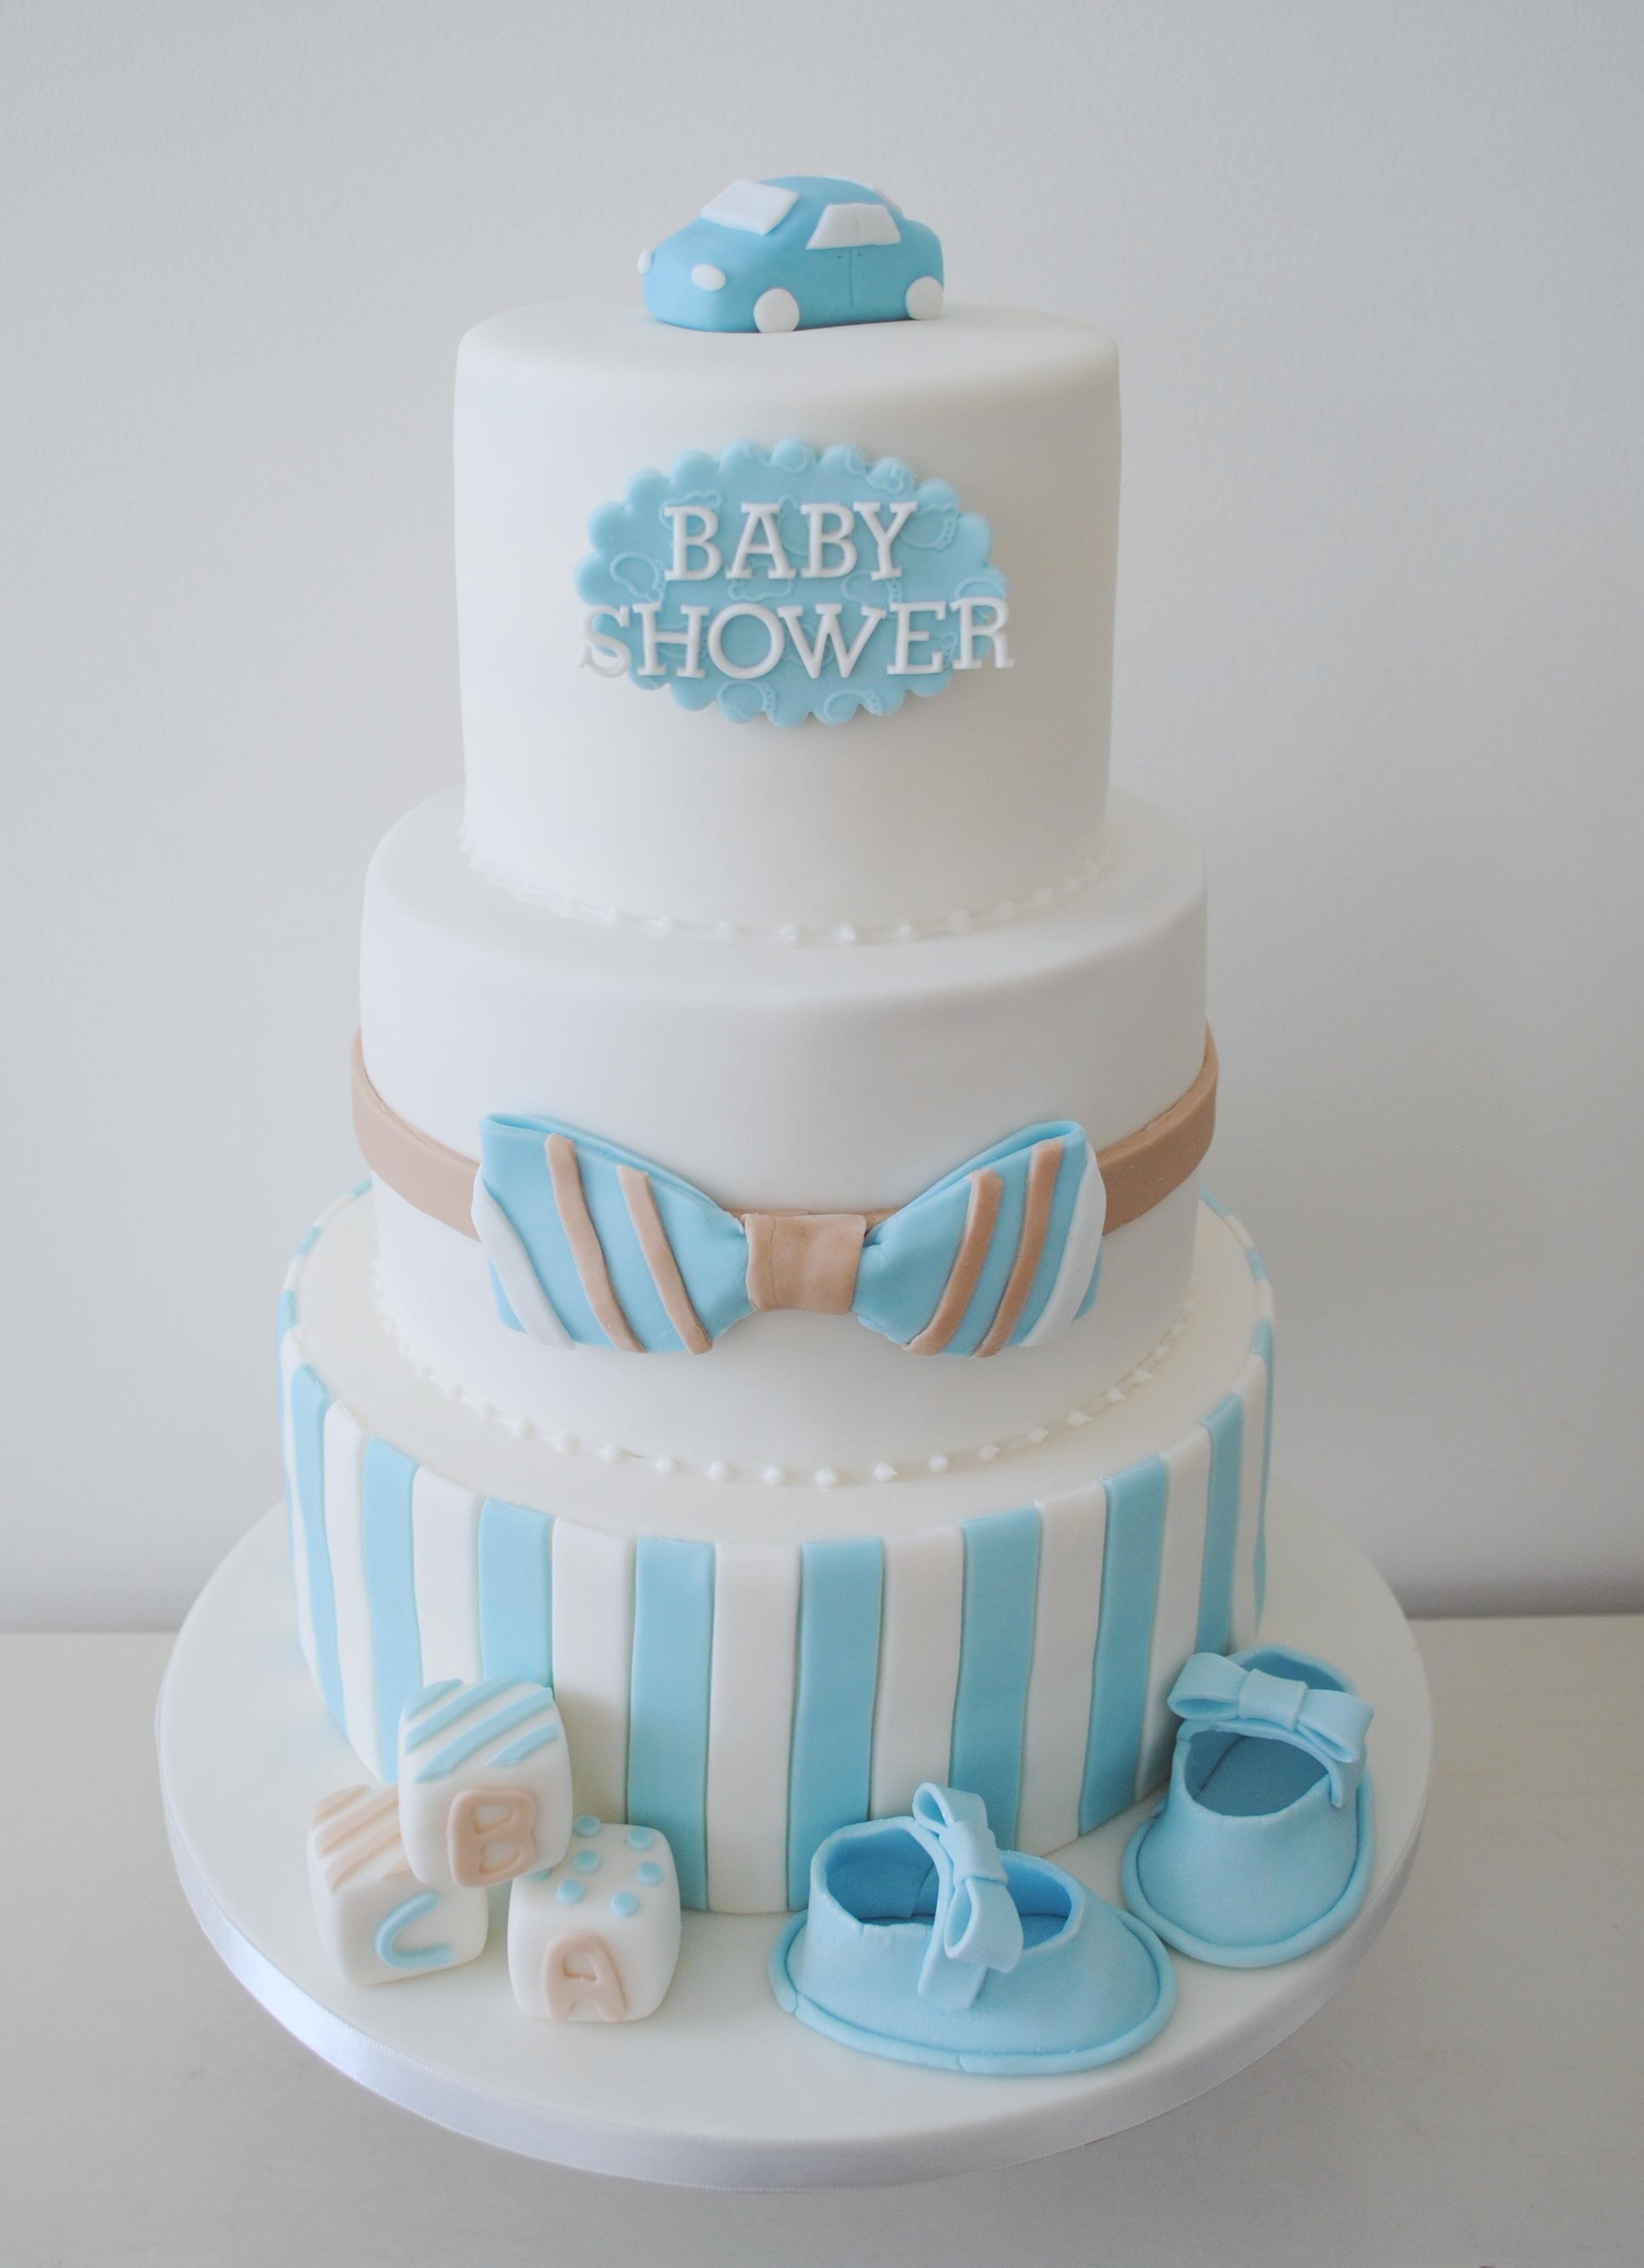 3 tiered baby shower cake